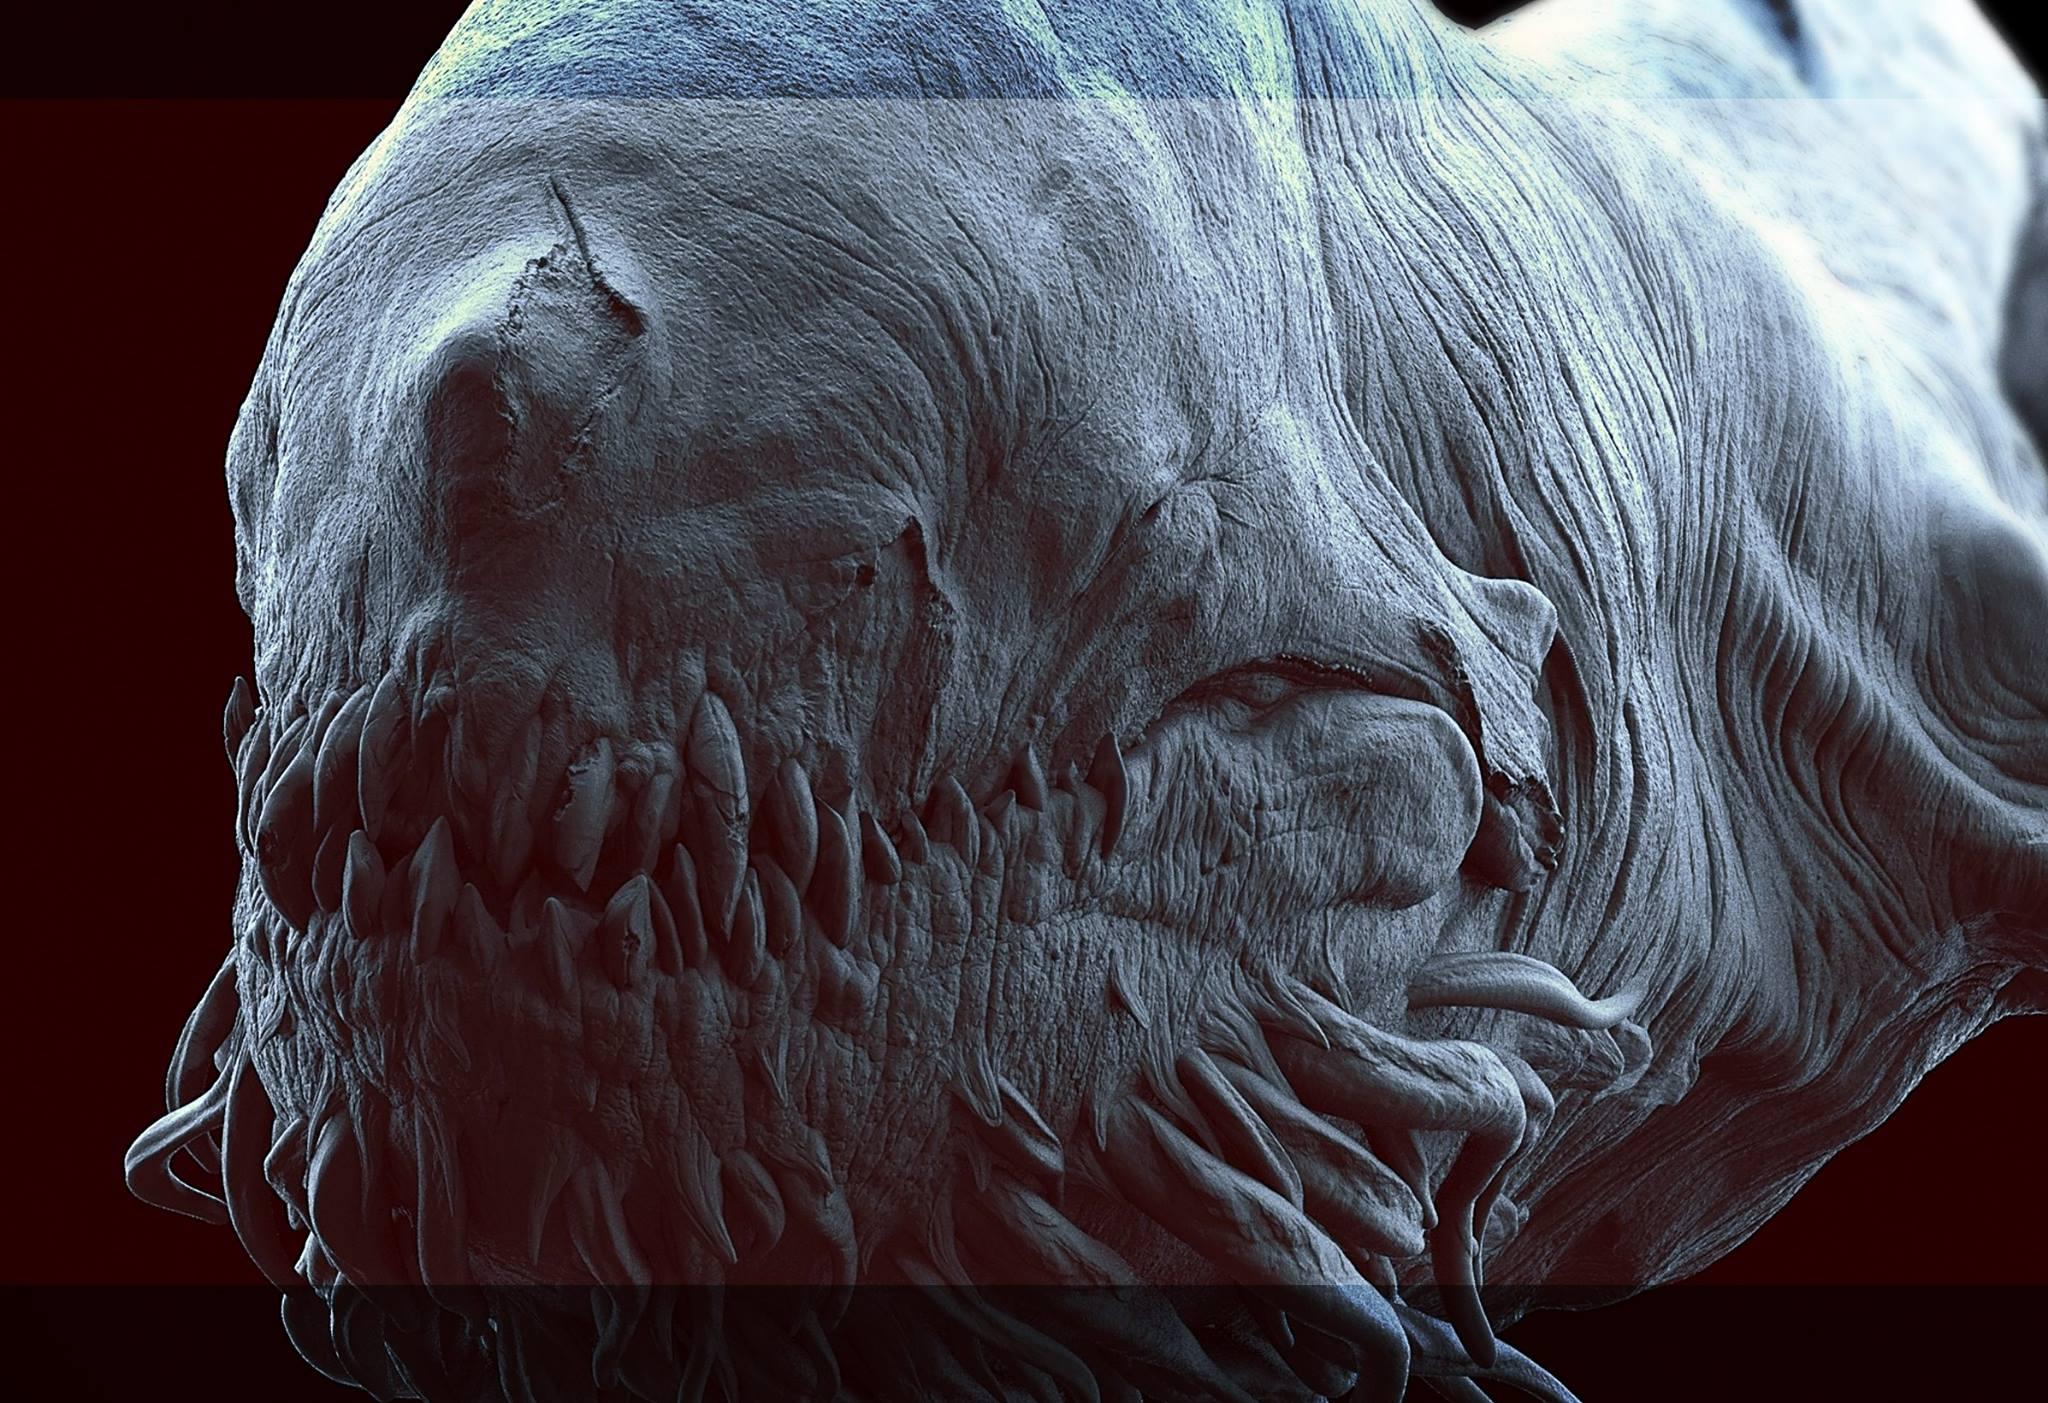 High Resolution Wallpaper | Leviathan 2048x1403 px